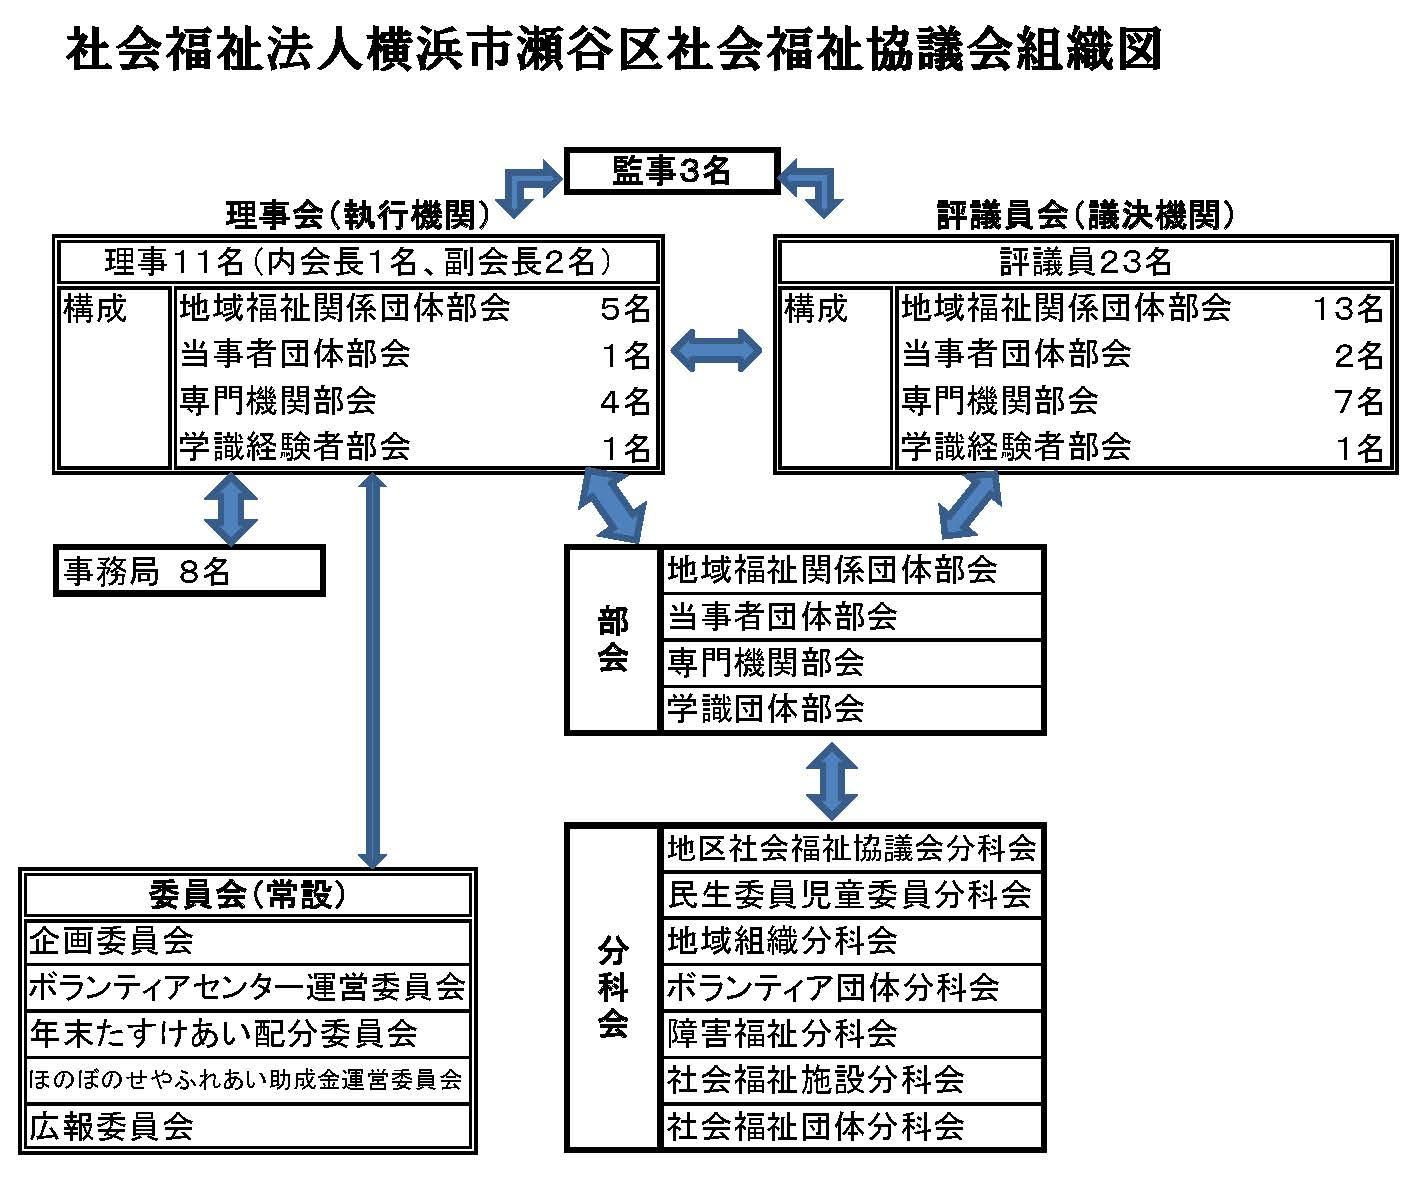 社協の構成